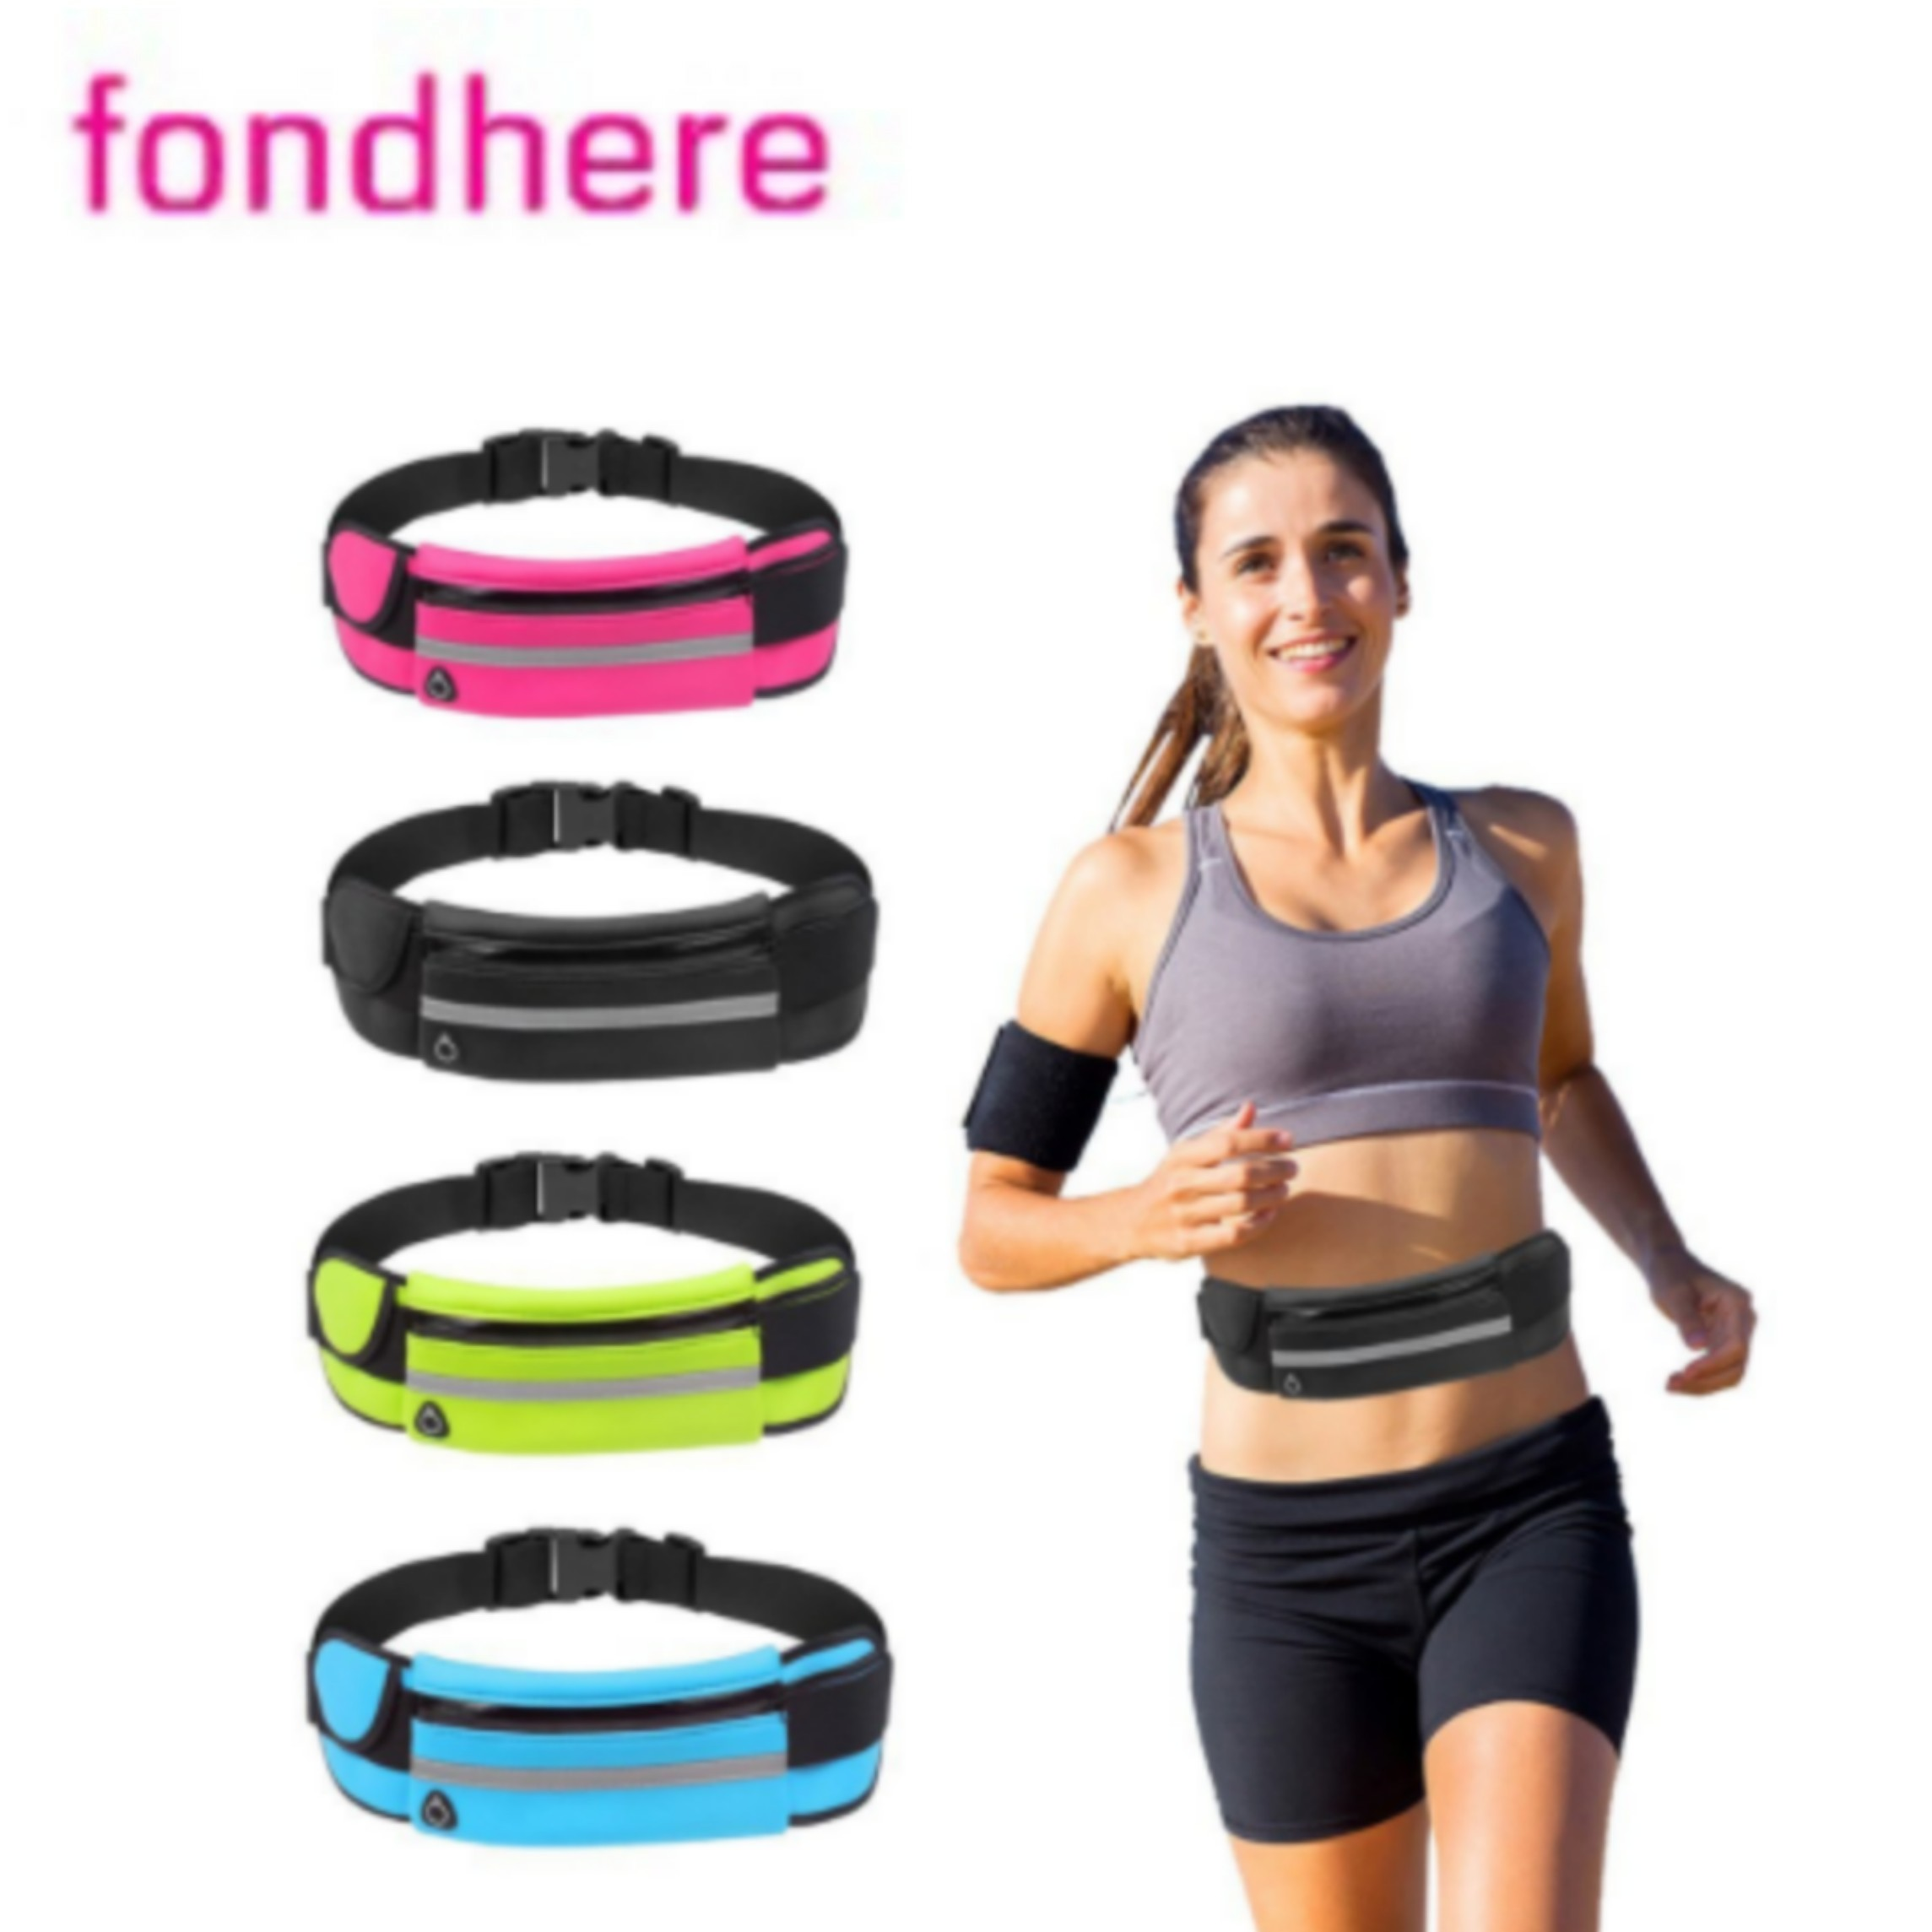 Fondhere Running Mobile Phone Pockets Fitness Female Models Male Mobile Phone Belt Marathon Running Equipment Outdoor Pouch Soft